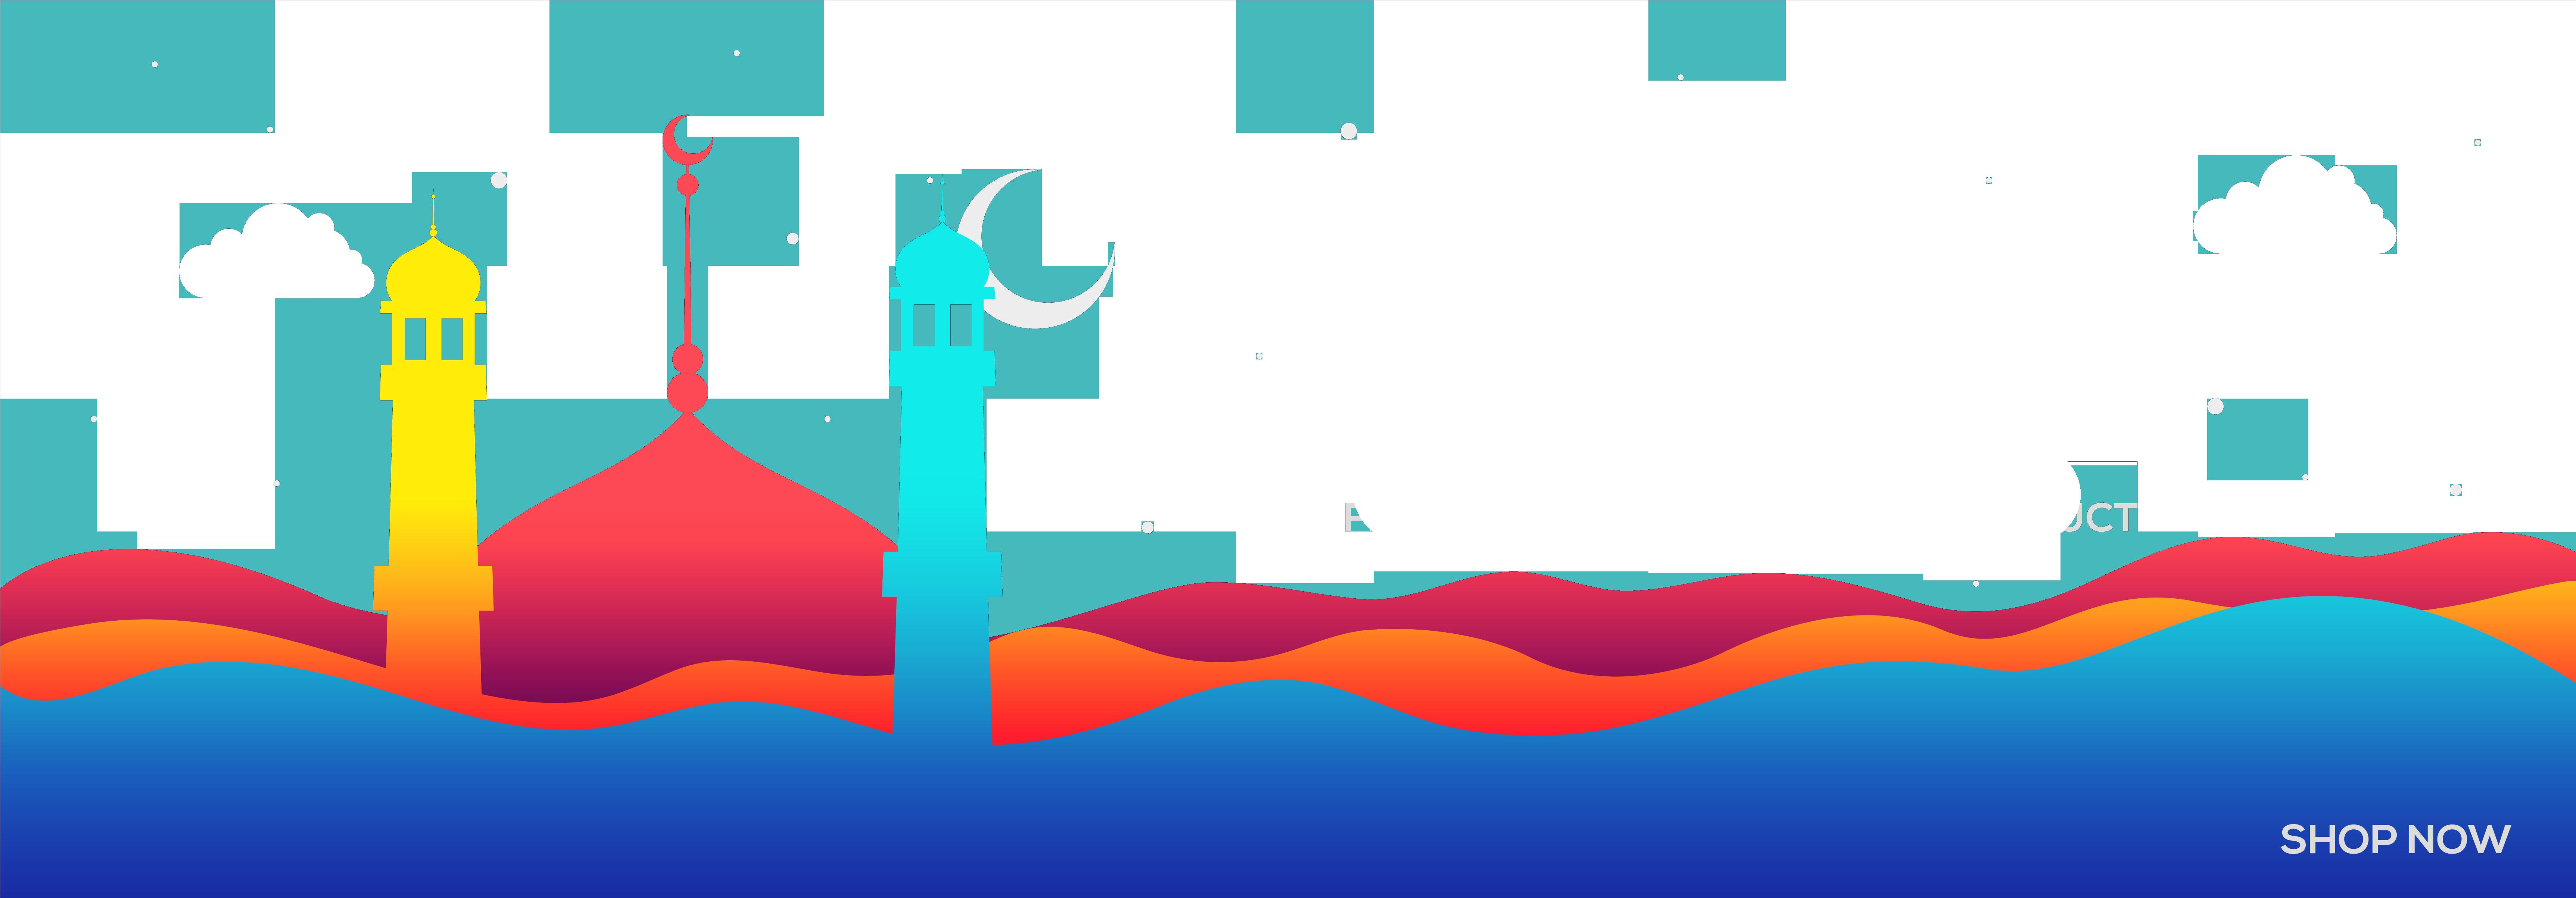 6901x2406 Eid Mubarak Png Download